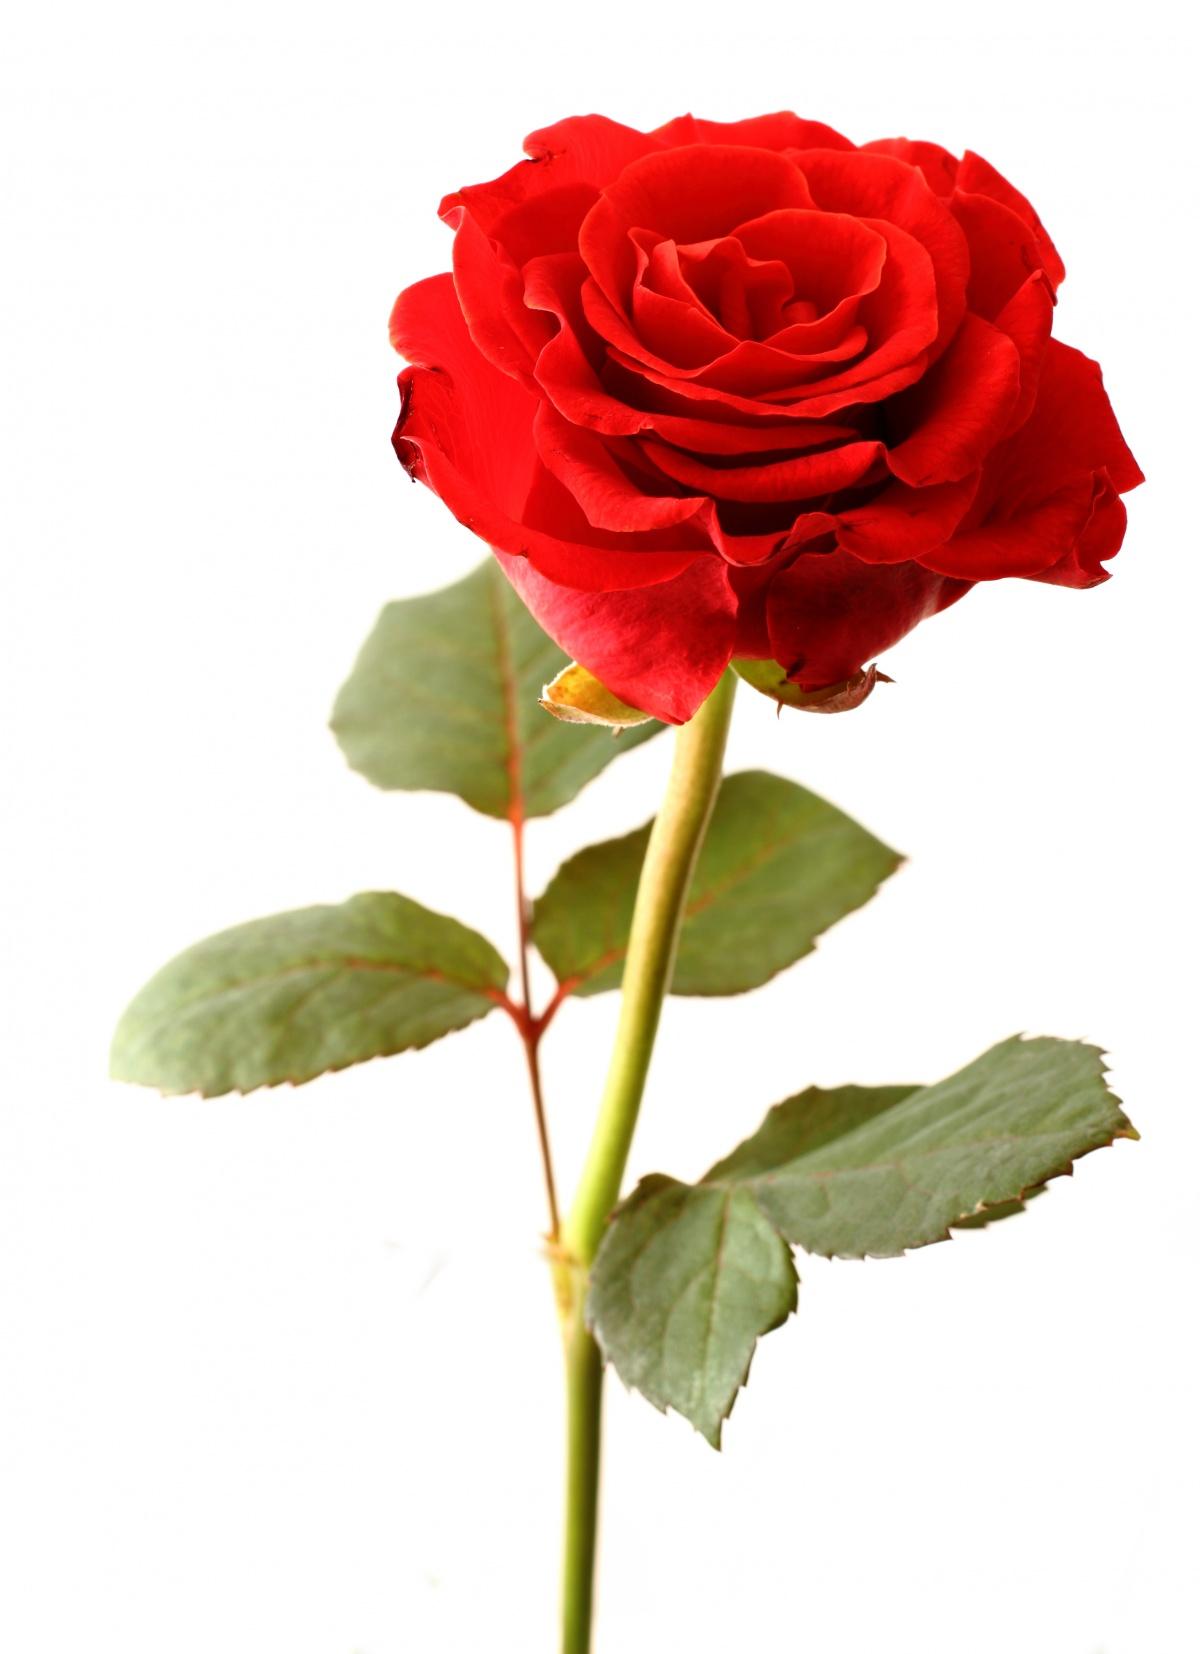 Single Rose Wallpaper Hd Rosa Flor Www Imgkid Com The Image Kid Has It